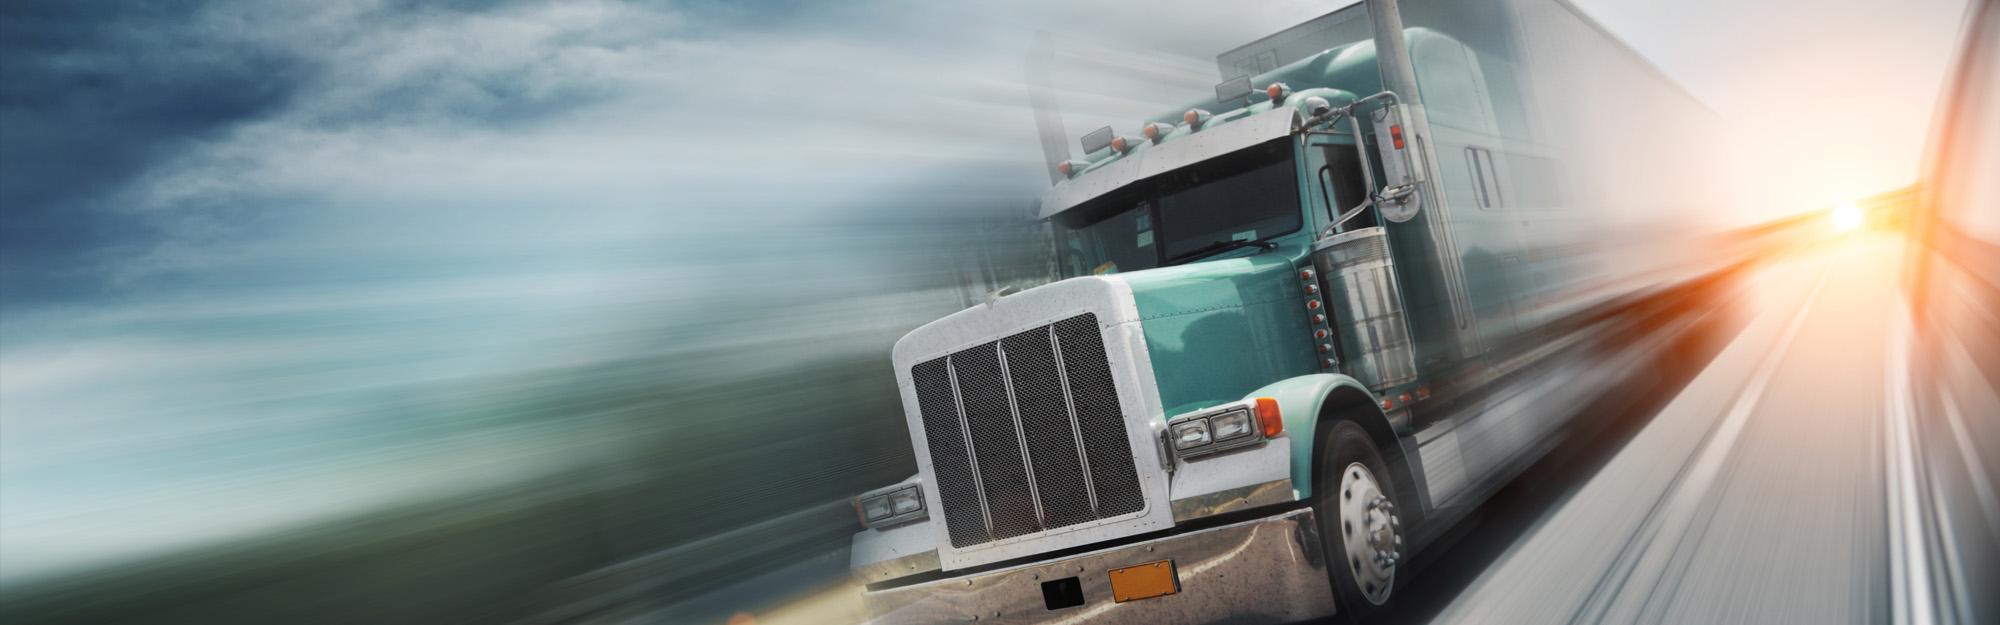 24/7 Mobile Truck & Trailer Repair Service in Mississauga Brampton Toronto and all GTA